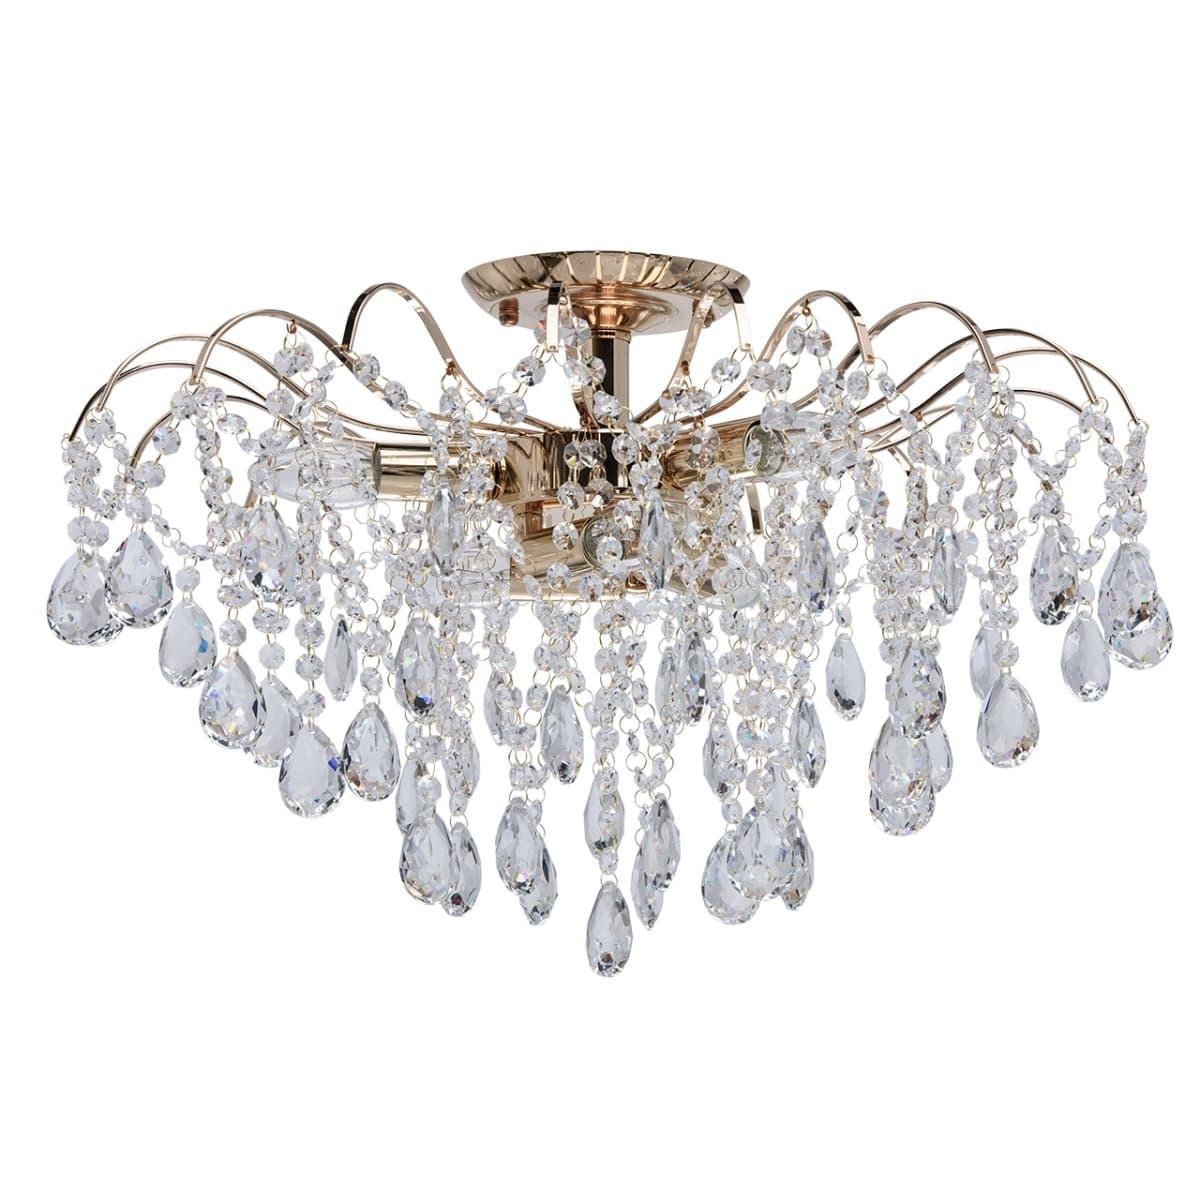 Plafoniera DeMarkt Crystal Venezia 464017406 vivre.ro